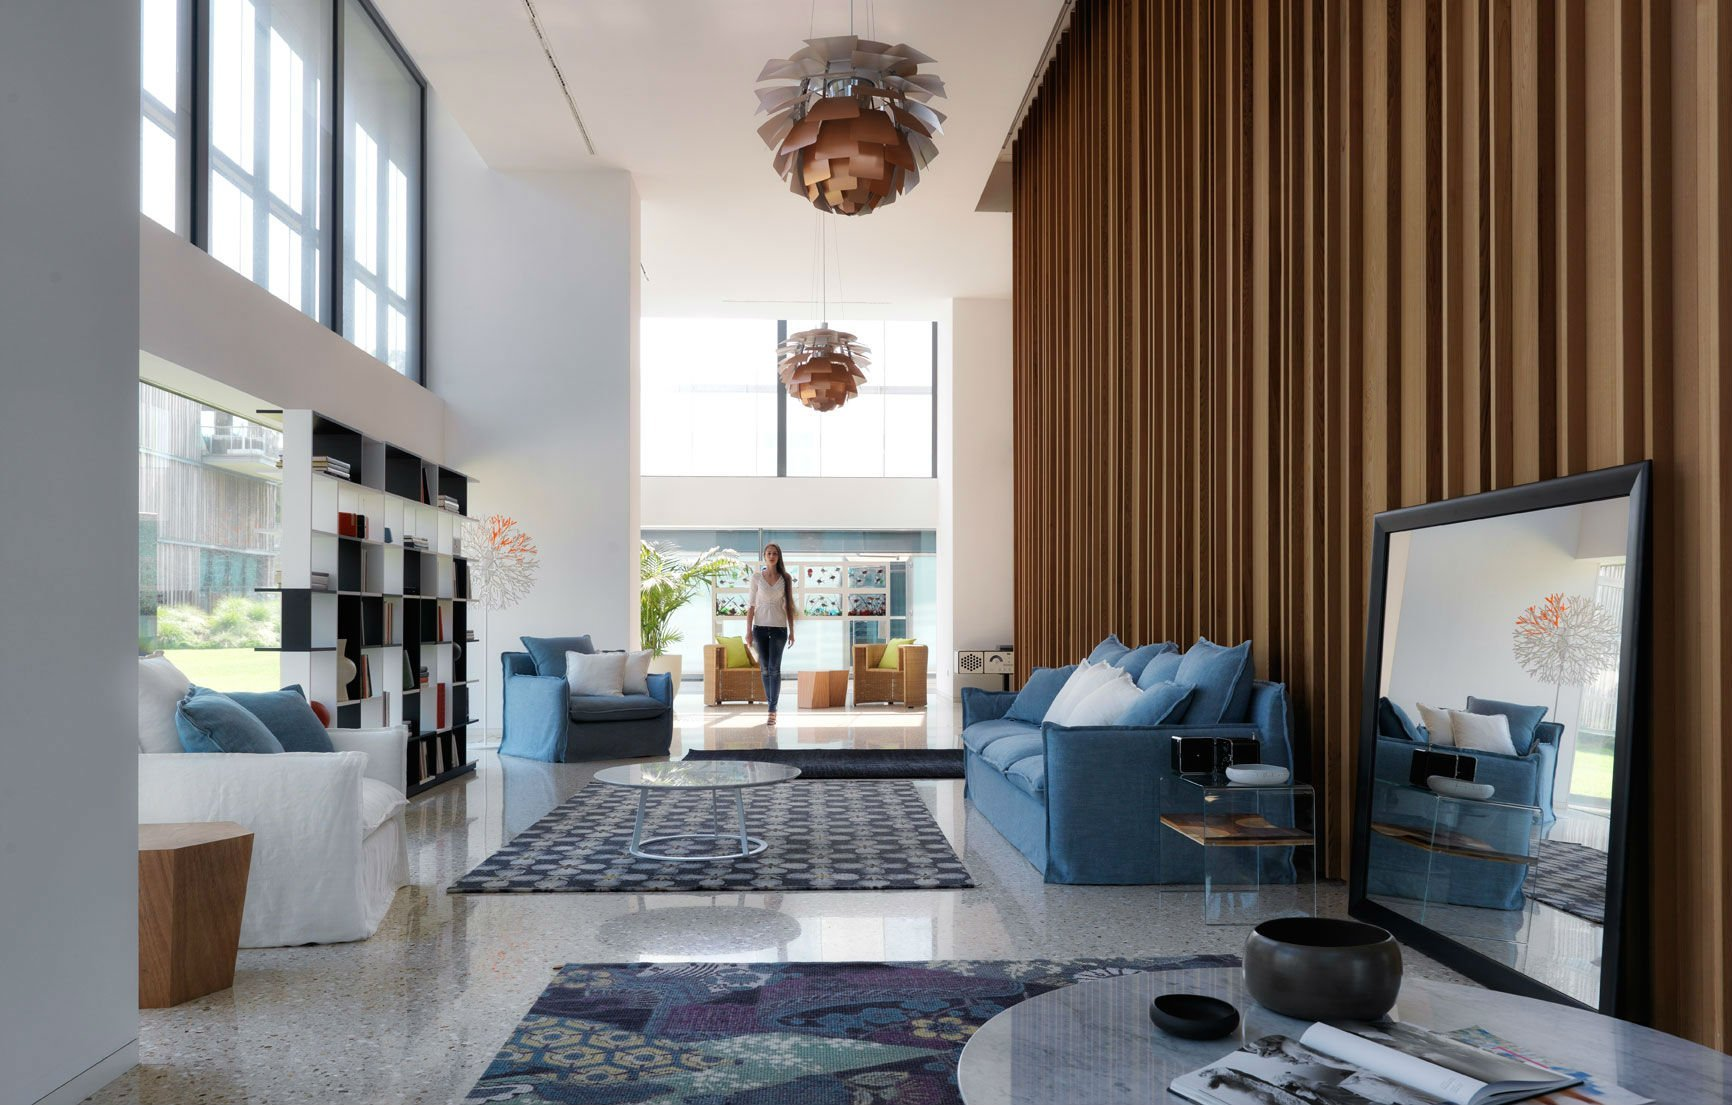 Grande salone con sofà, poltrone blu e bianca e scaffale nera e bianca